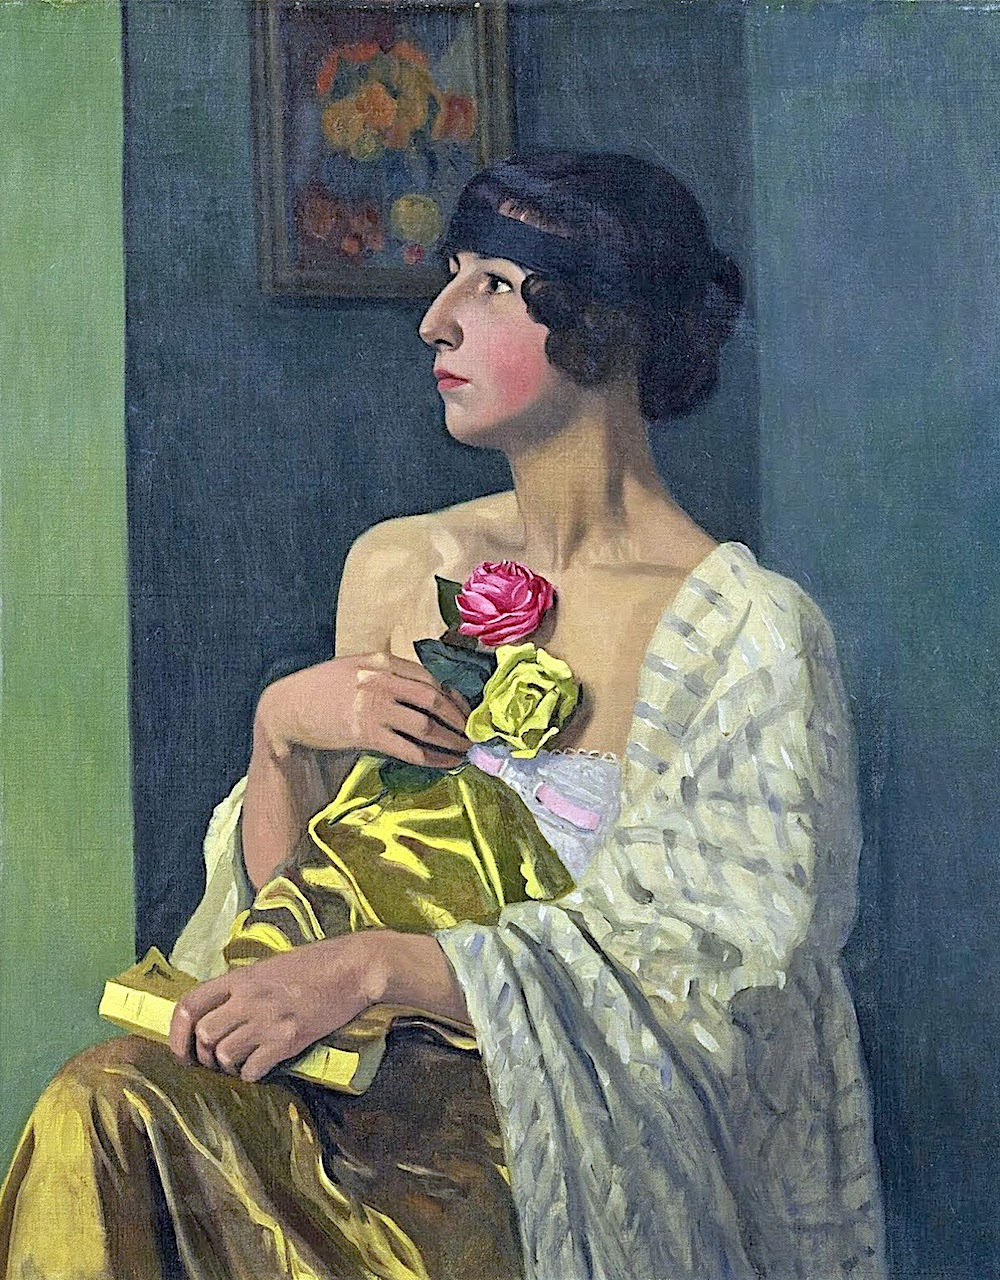 Félix Vallotton 1919, portrait of a woman